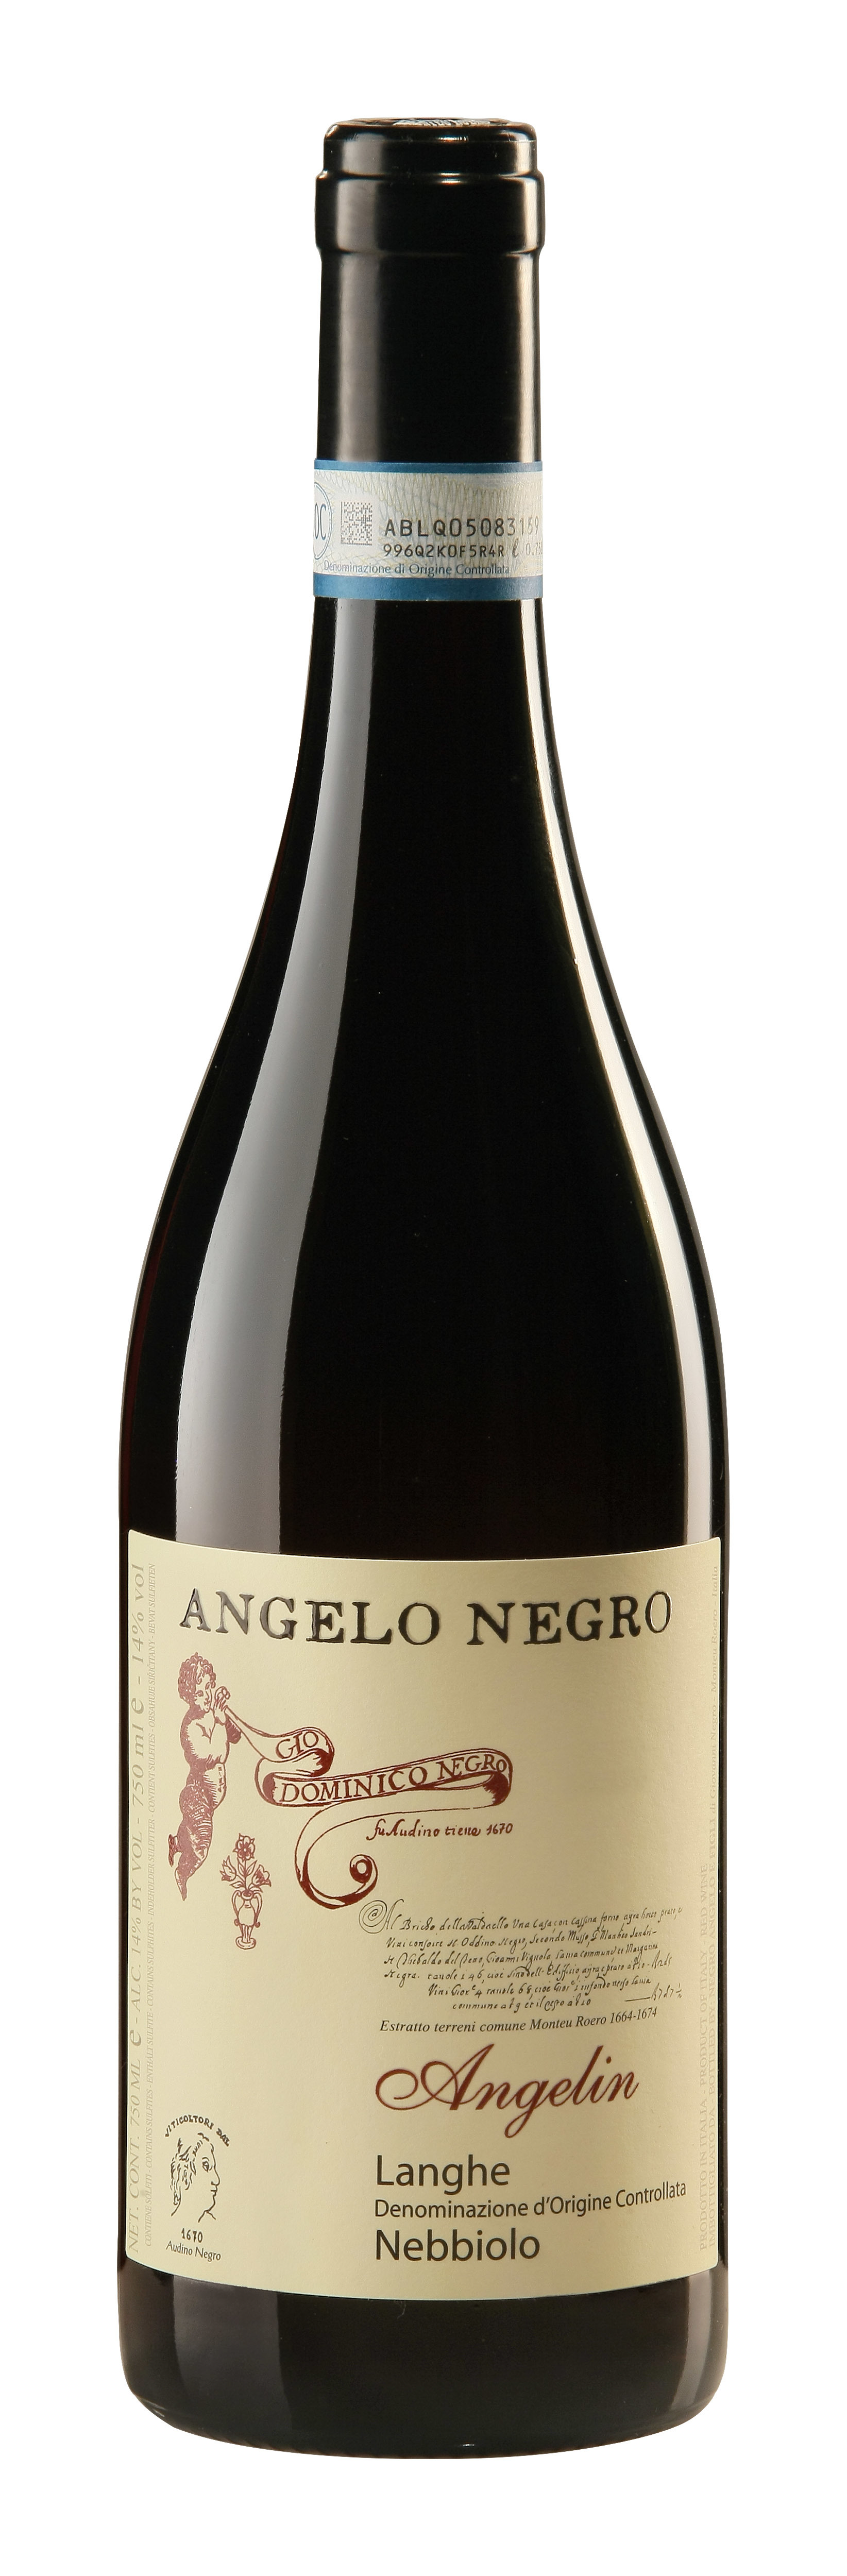 Negro Angelin Langhe Nebbiolo